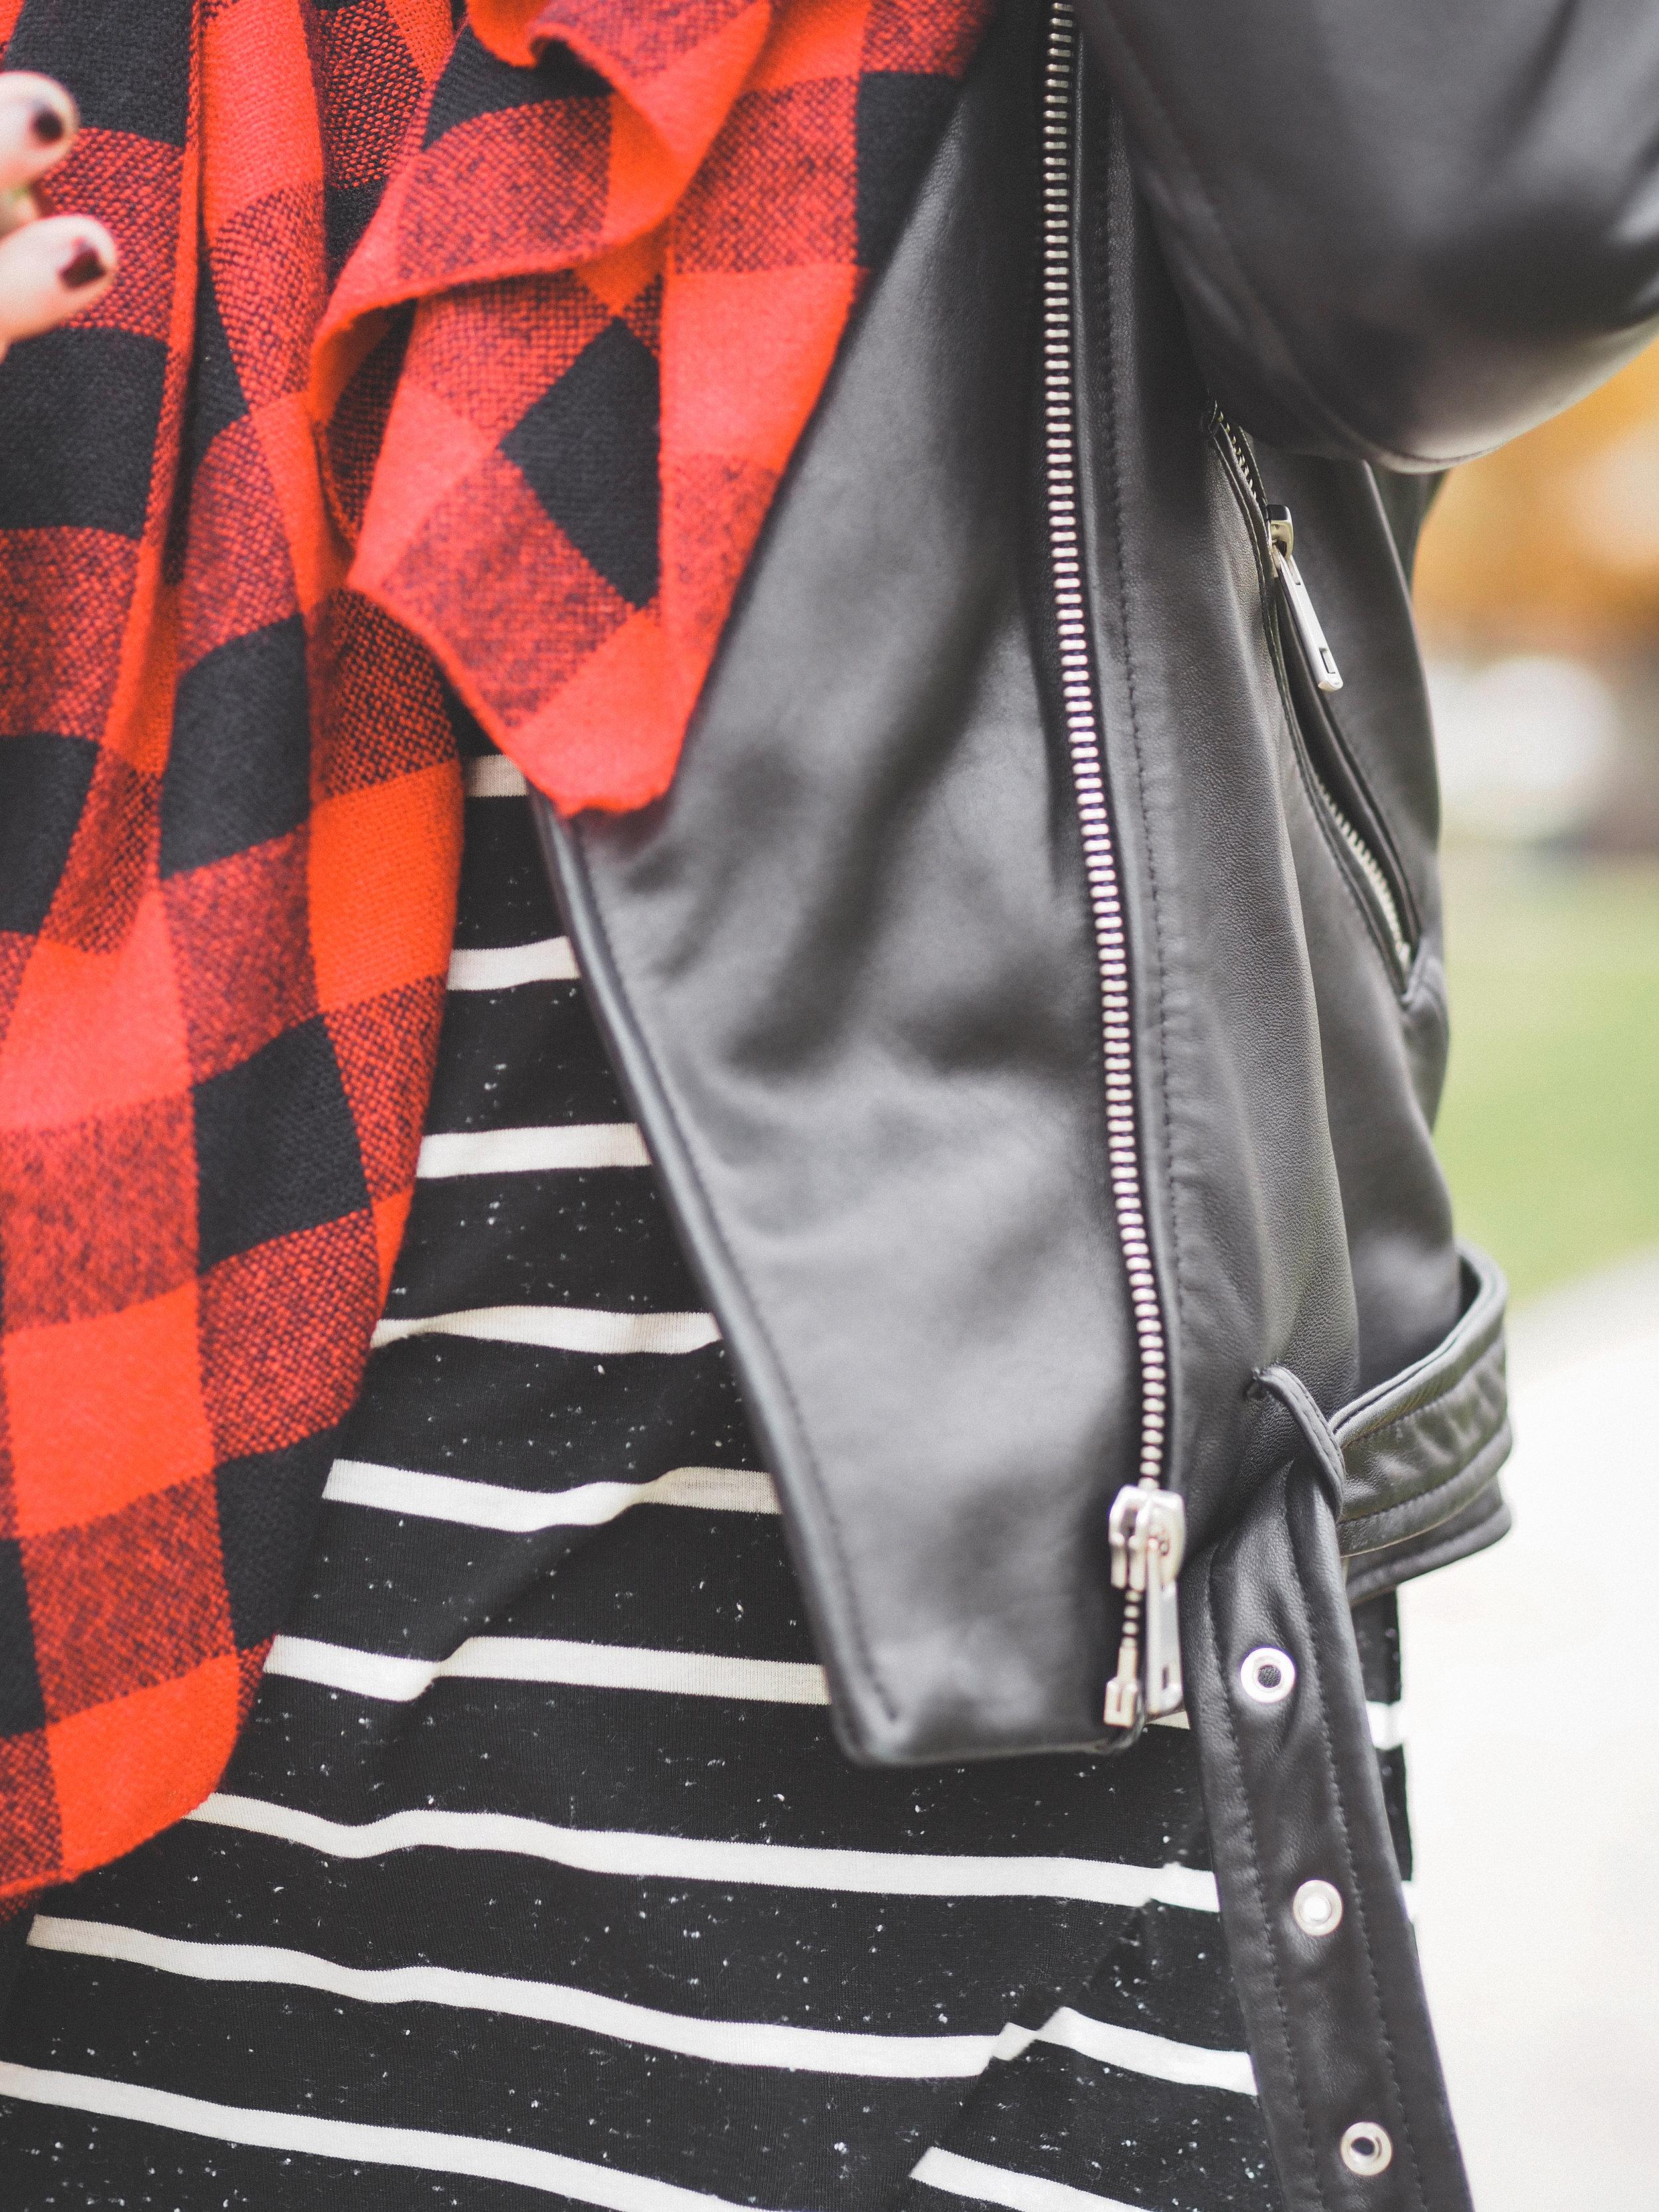 buffalo-plaid-scarf-leather-jacket-11.jpg